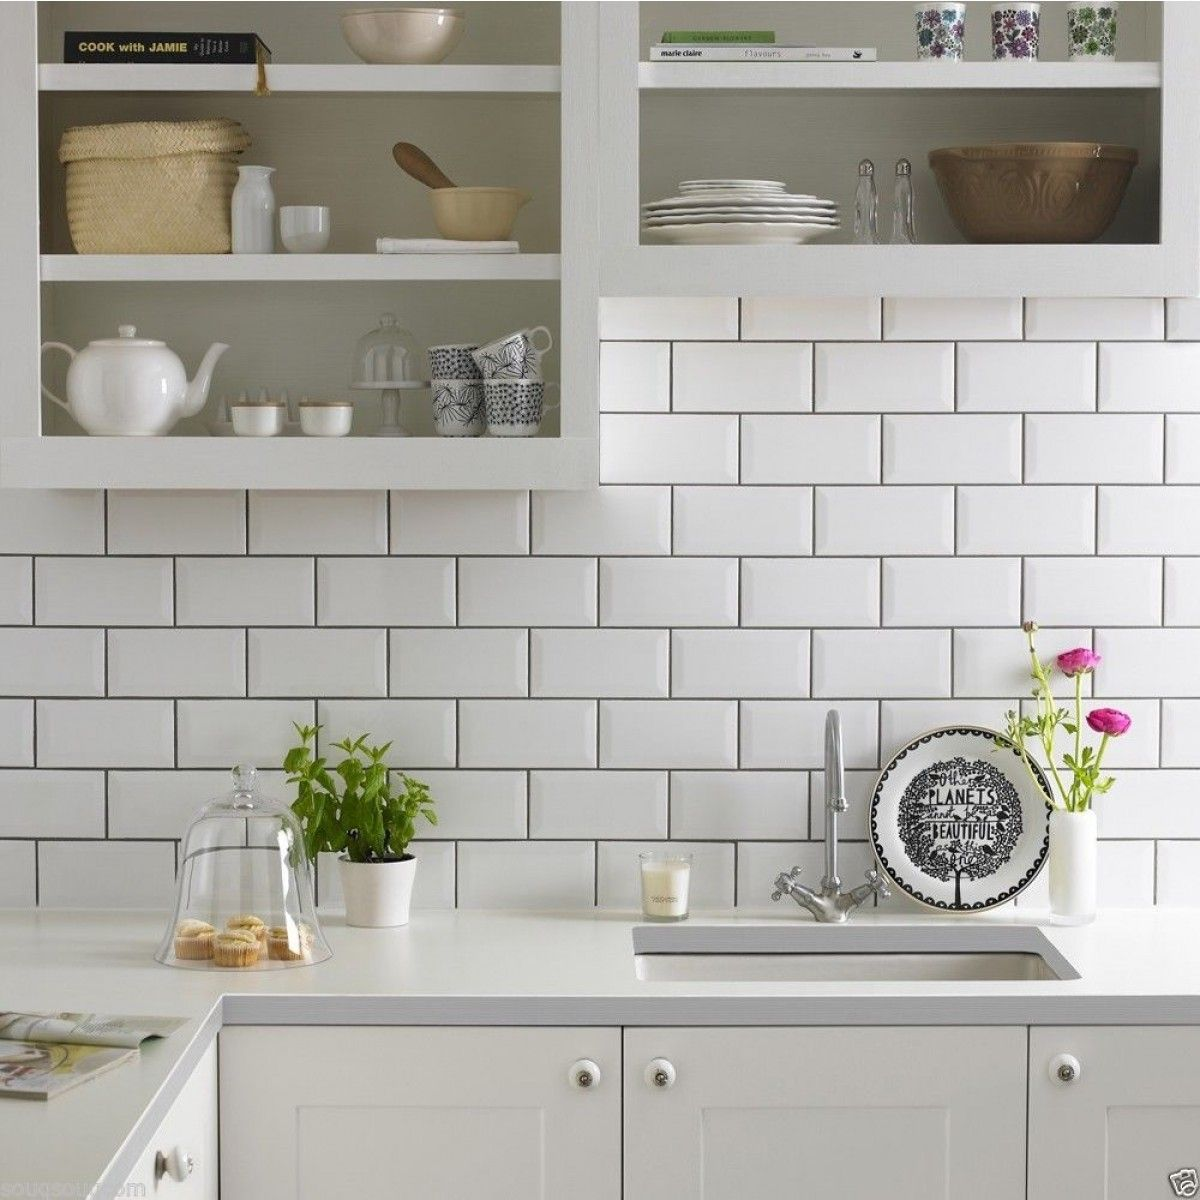 American Rectangular White Tiles Uk Google Search Brick Kitchen Kitchen Wall Tiles Ceramic Kitchen